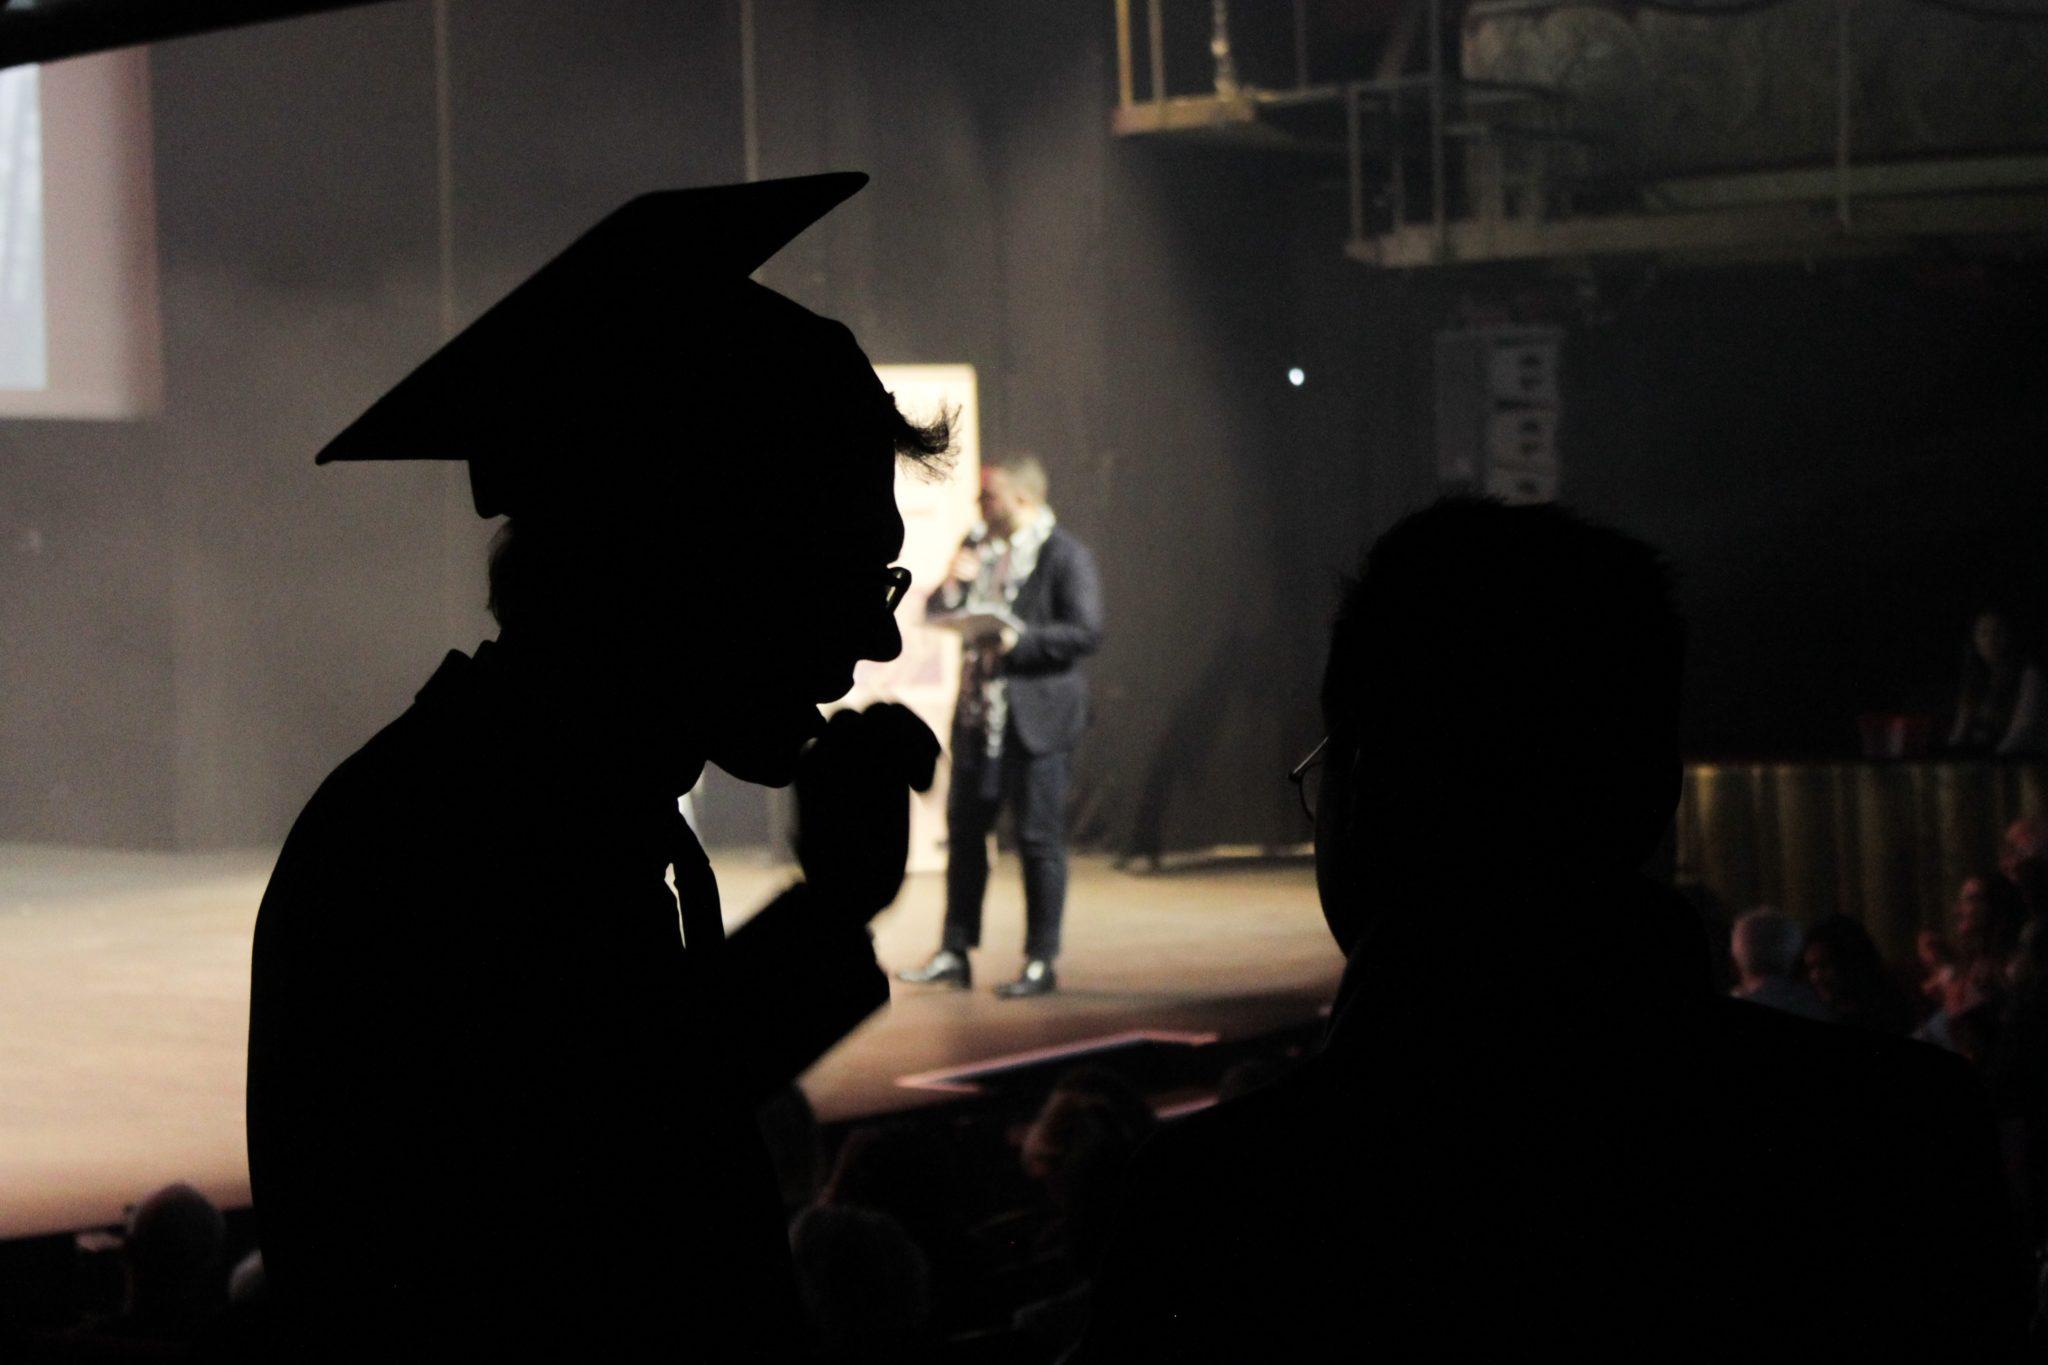 IMT_BS remise des diplomes (4)